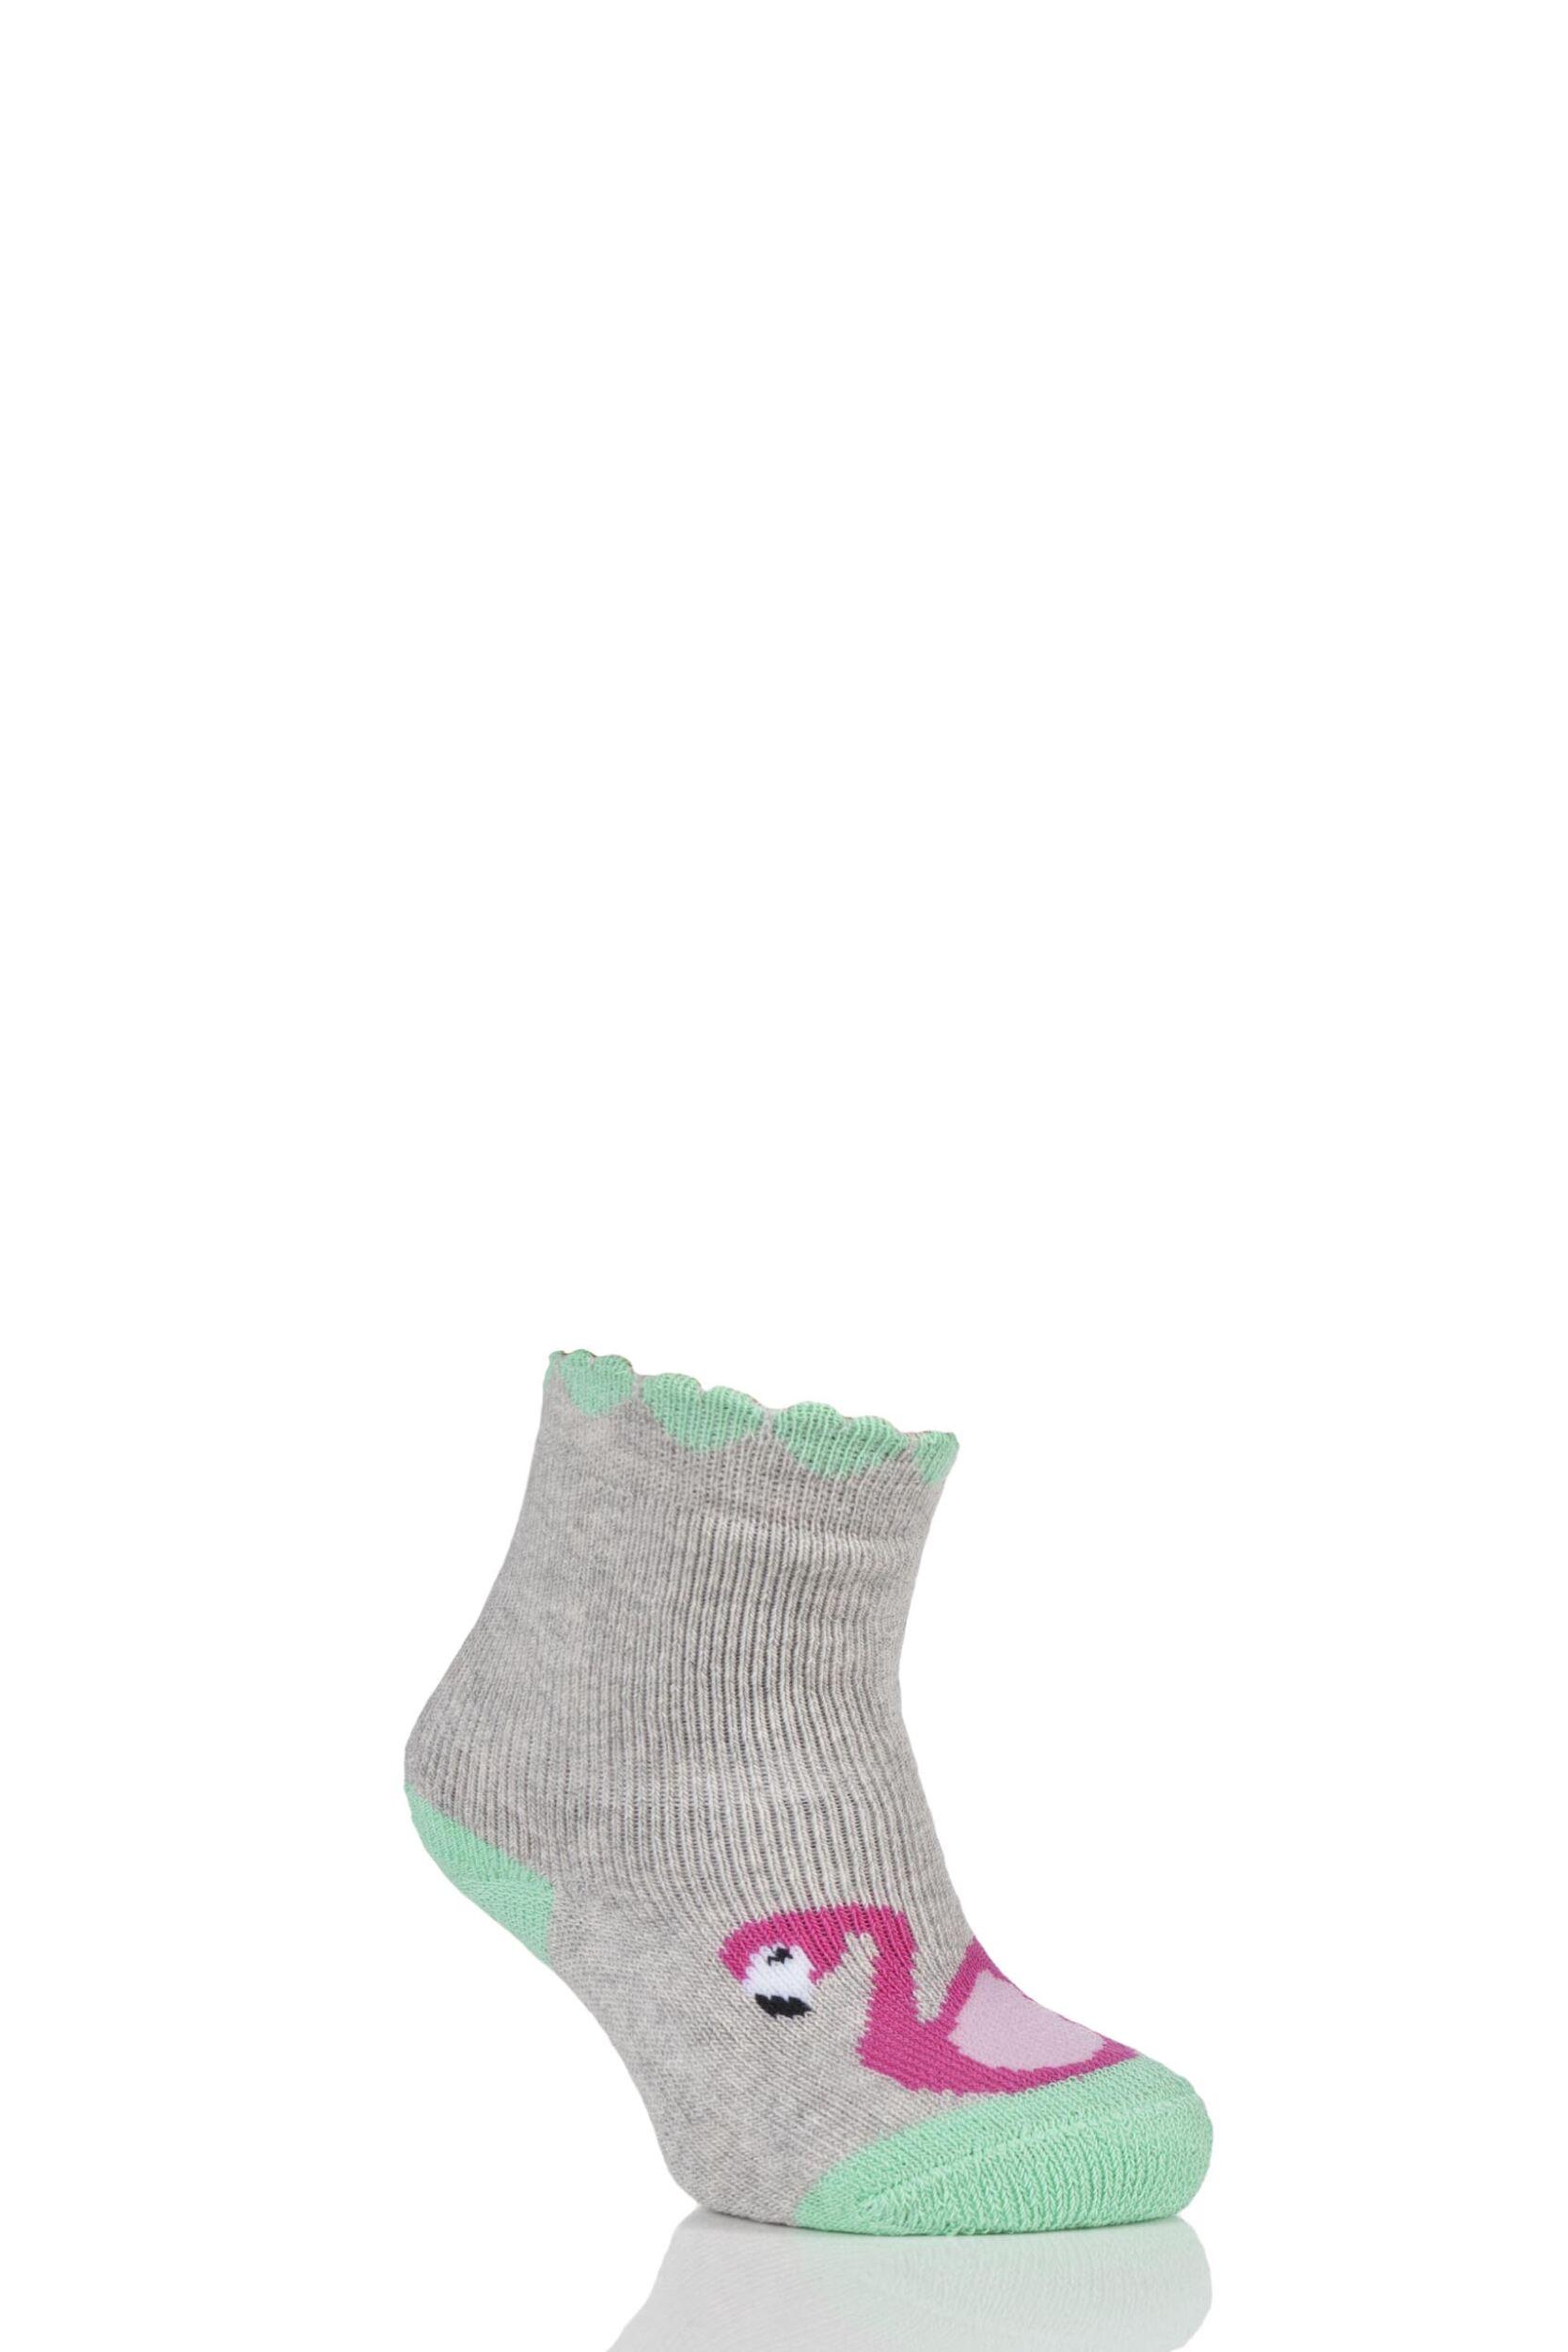 Image of Babies 1 Pair Falke Flamingo Catspad Socks with Grip